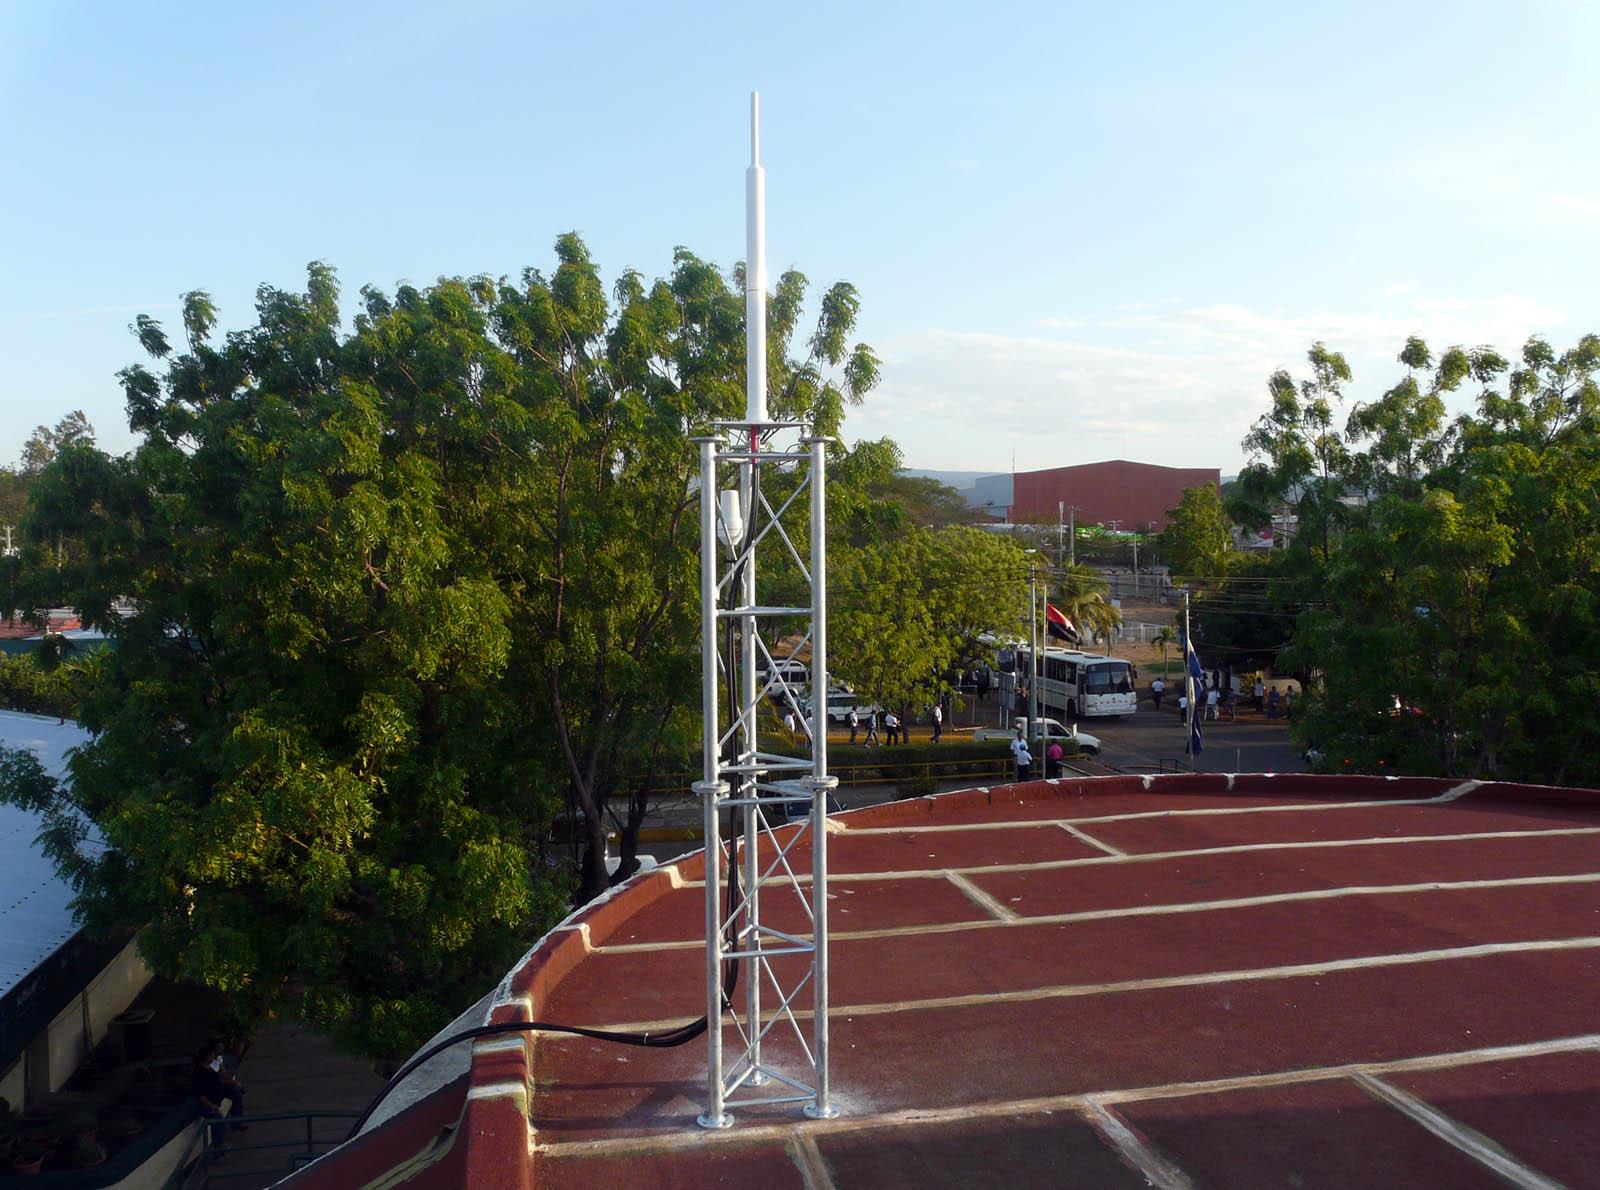 DORIS station: MANAGUA - NICARAGUA